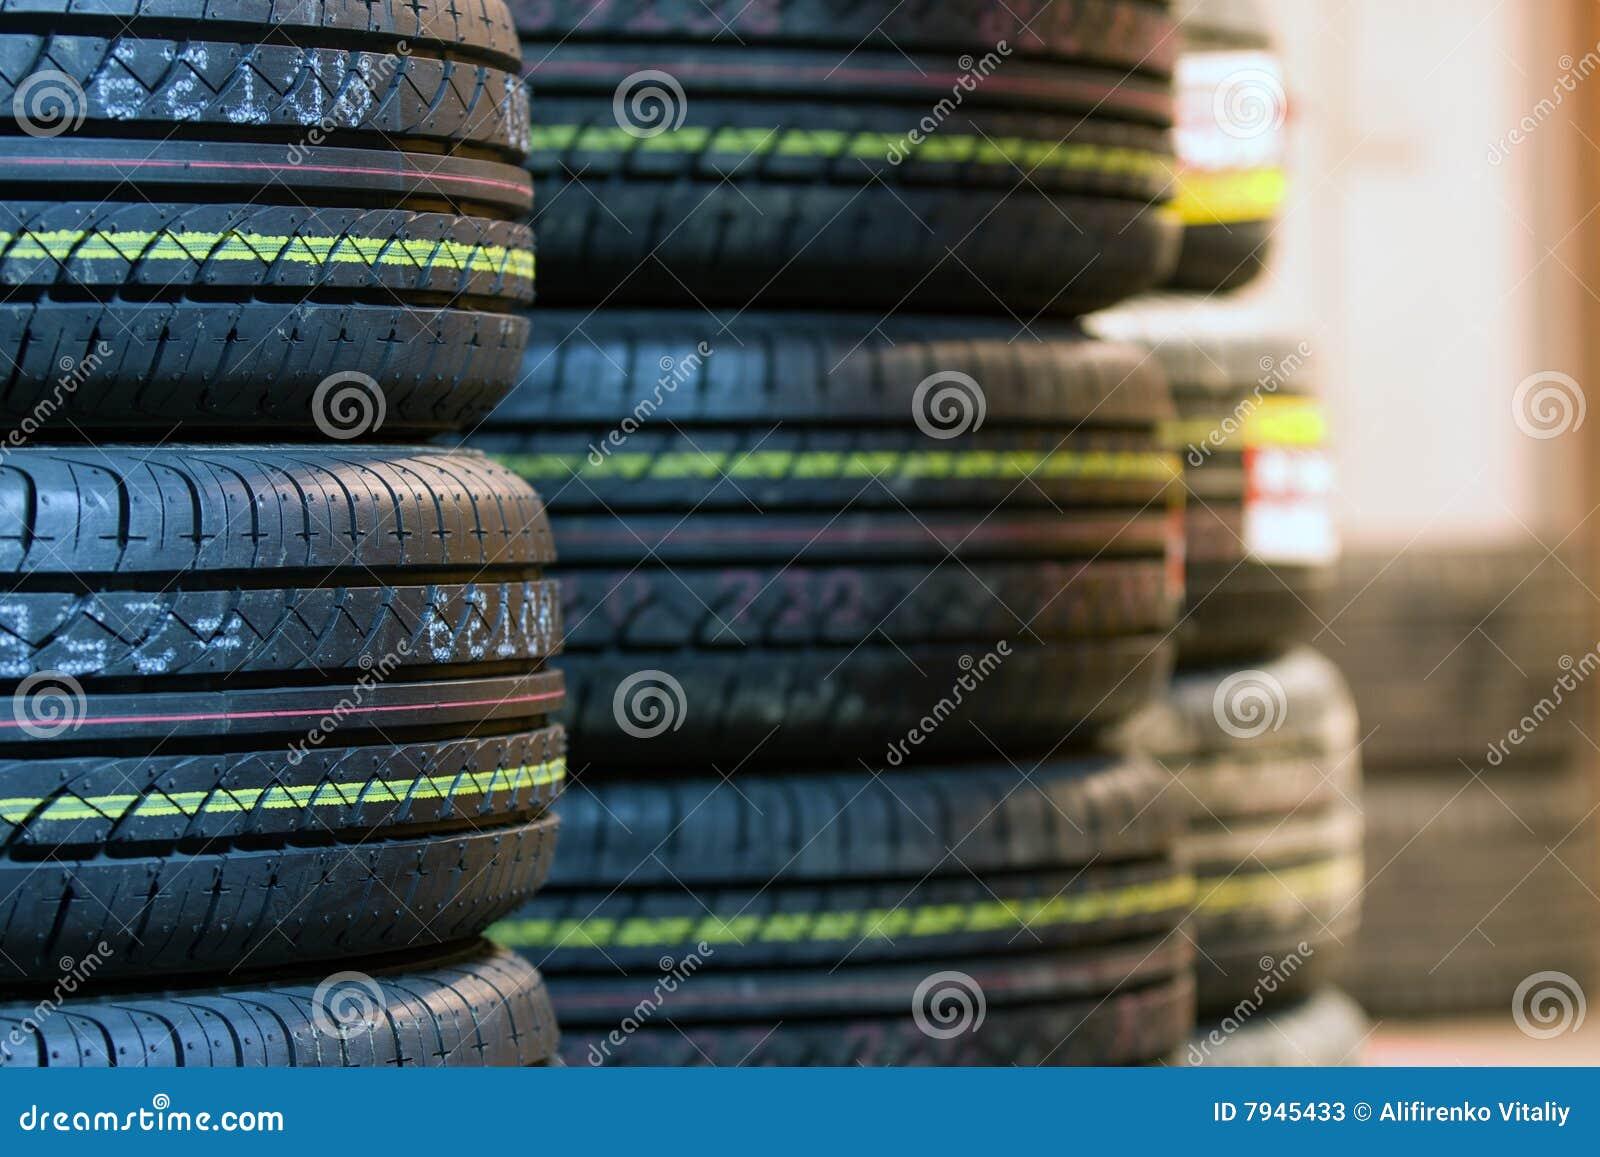 Tire tread close up